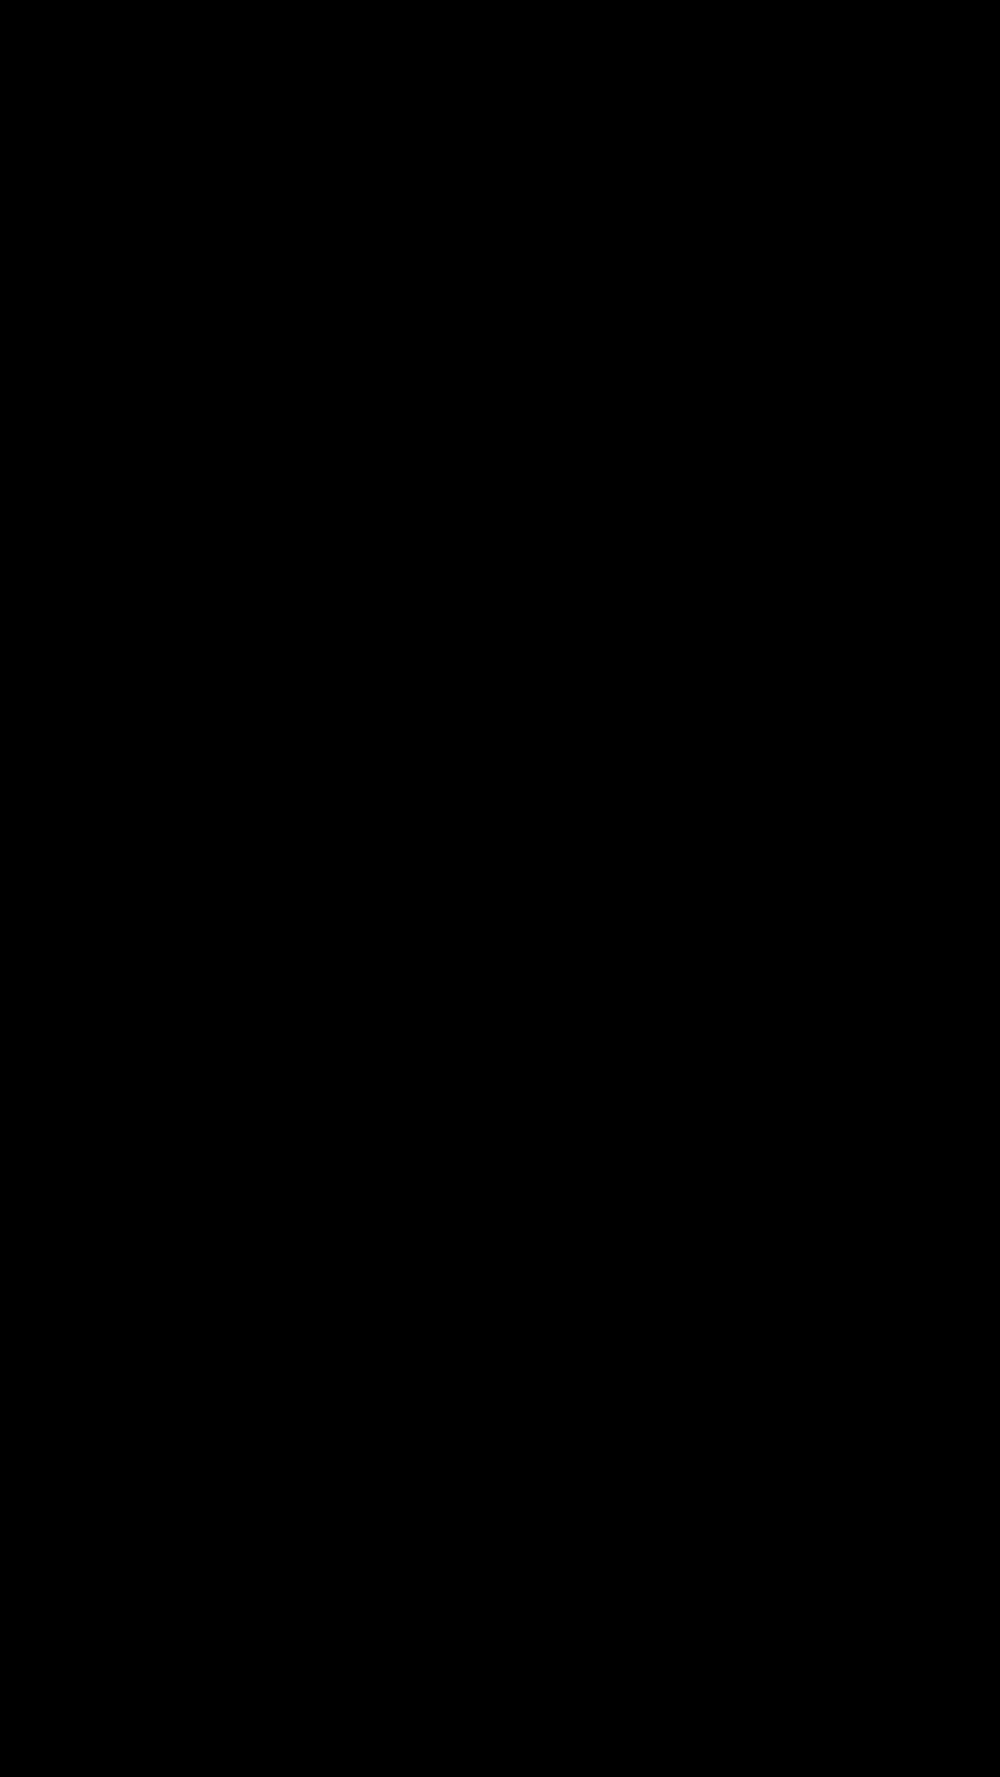 Black And White Vsco Wallpaper : black, white, wallpaper, Pegatina, @allylinck, Animal, Print, Wallpaper,, Cheetah, Background